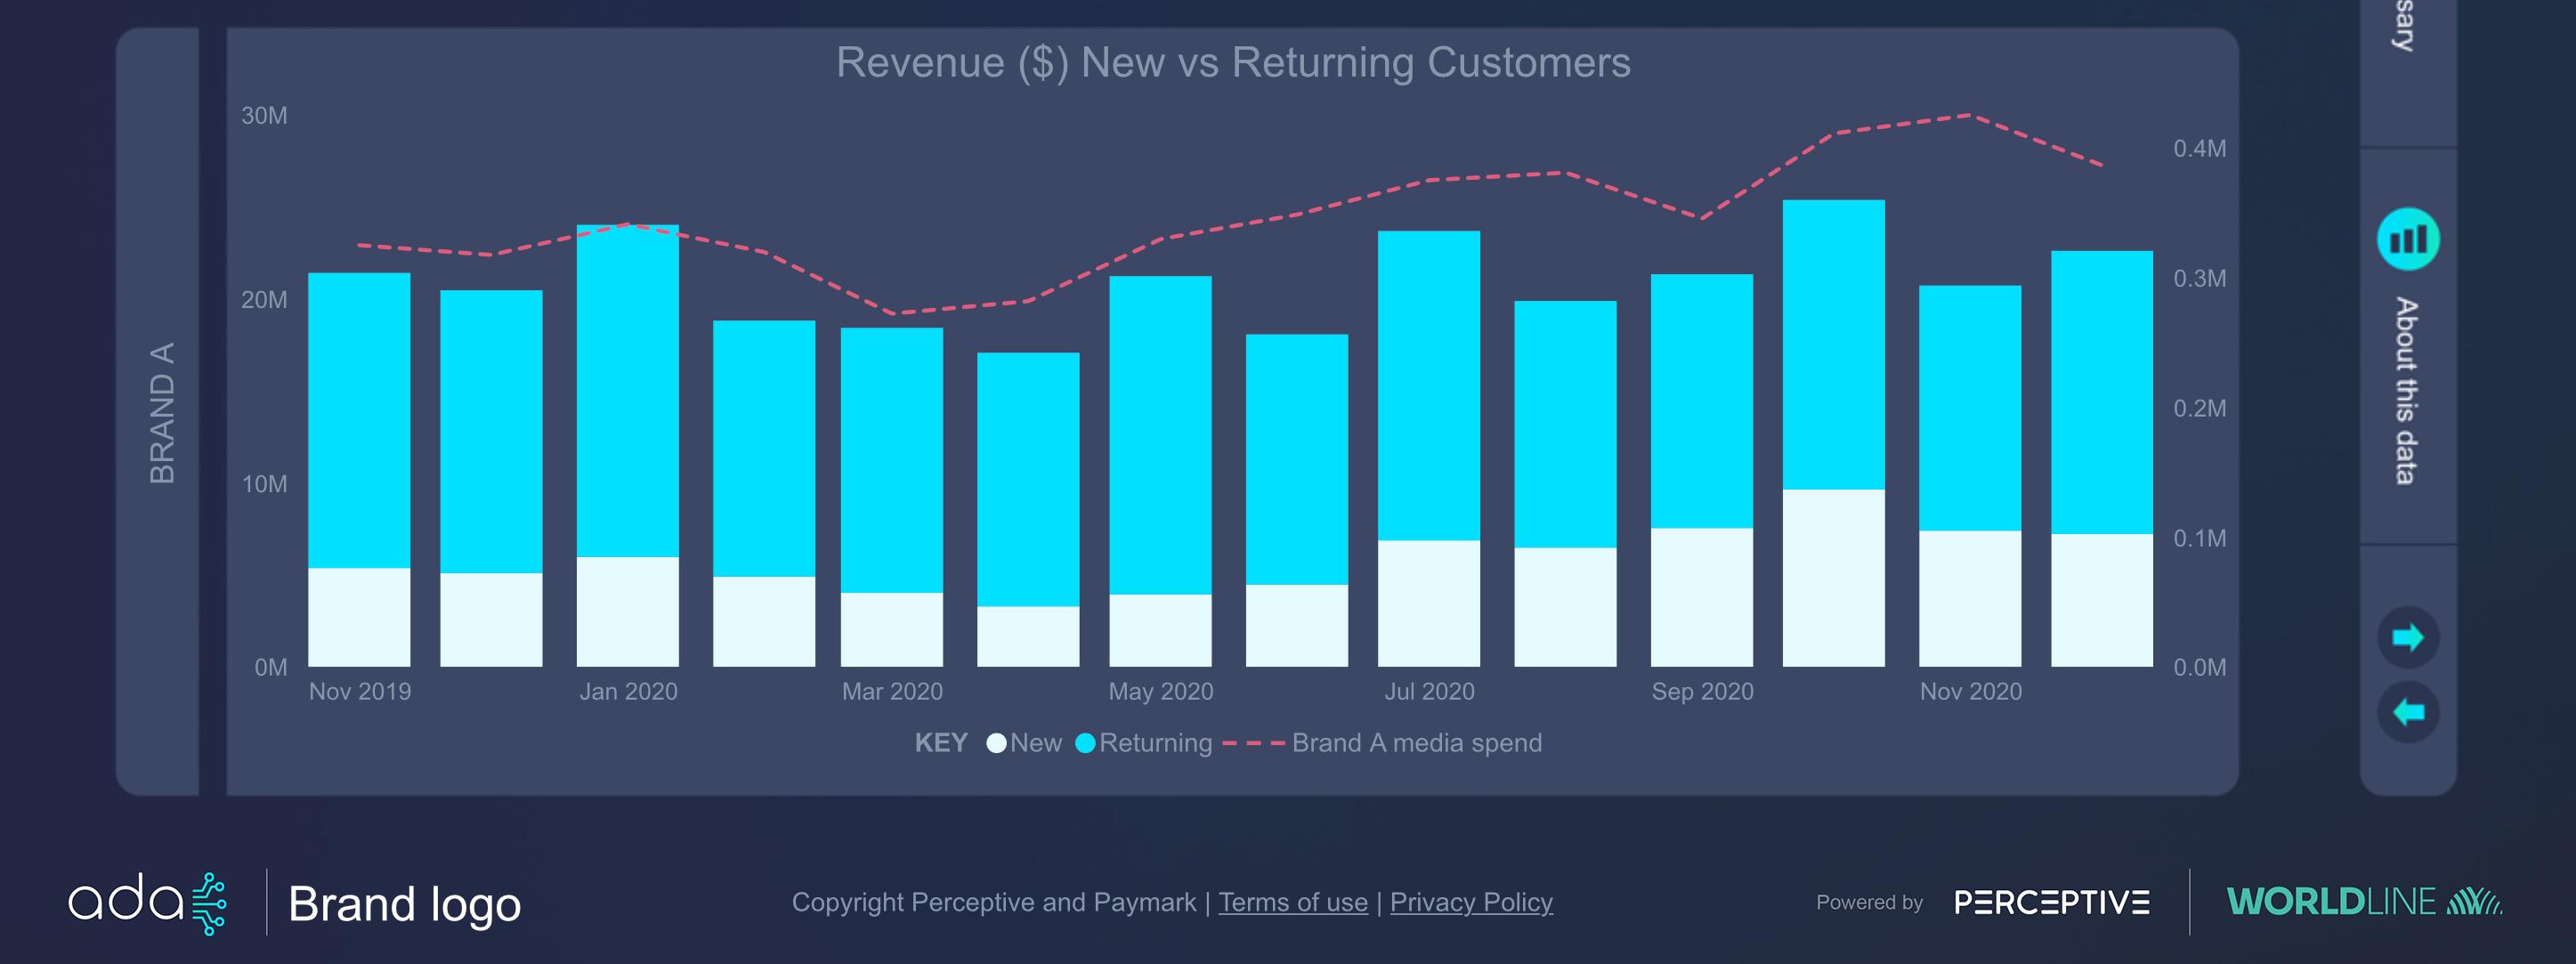 Ada-new-vs-returning-customers